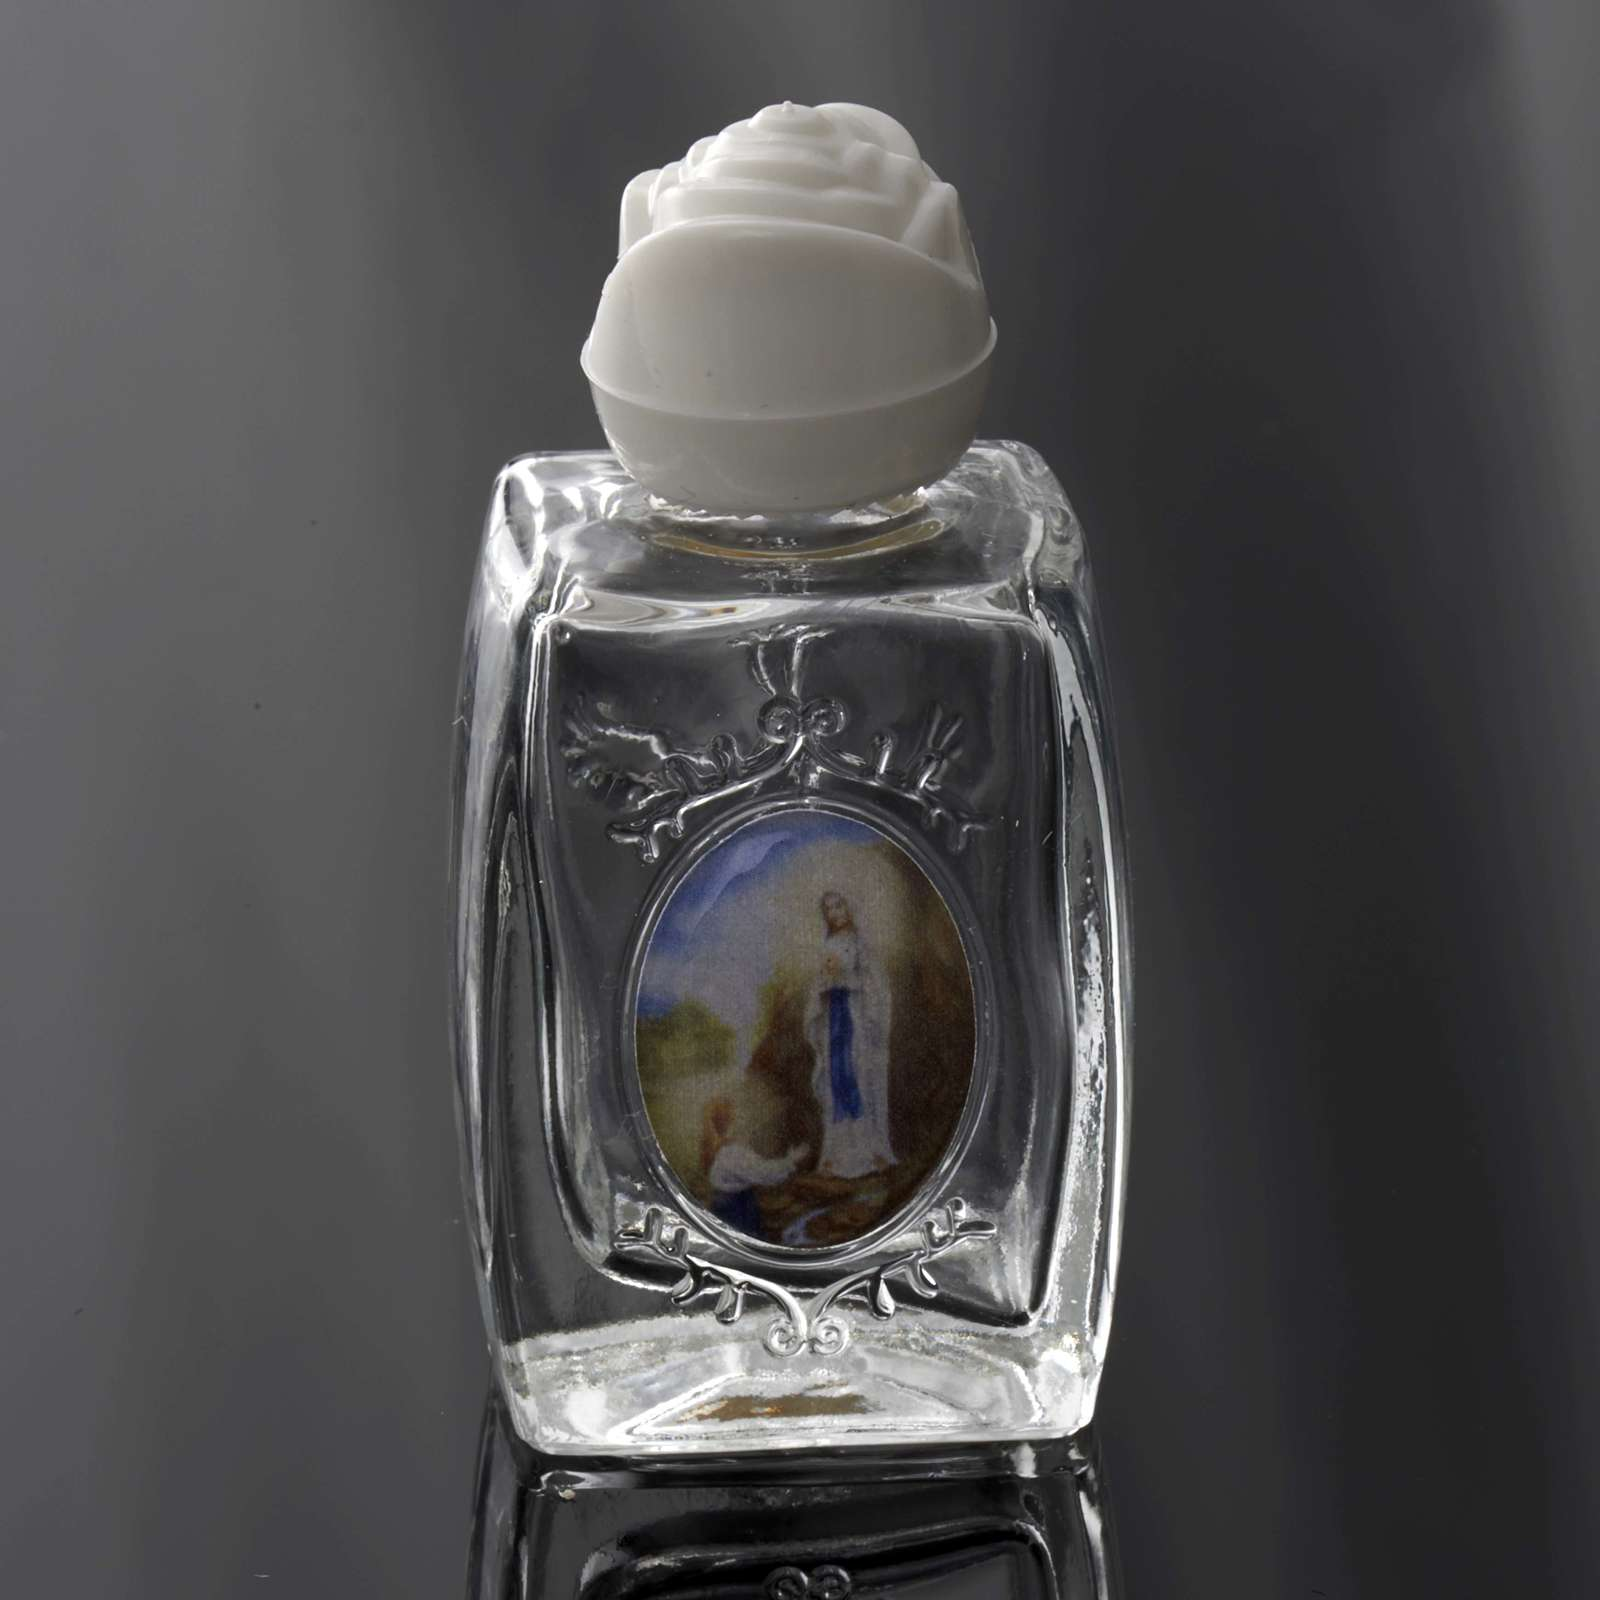 Bottiglietta Madonna di Lourdes 3